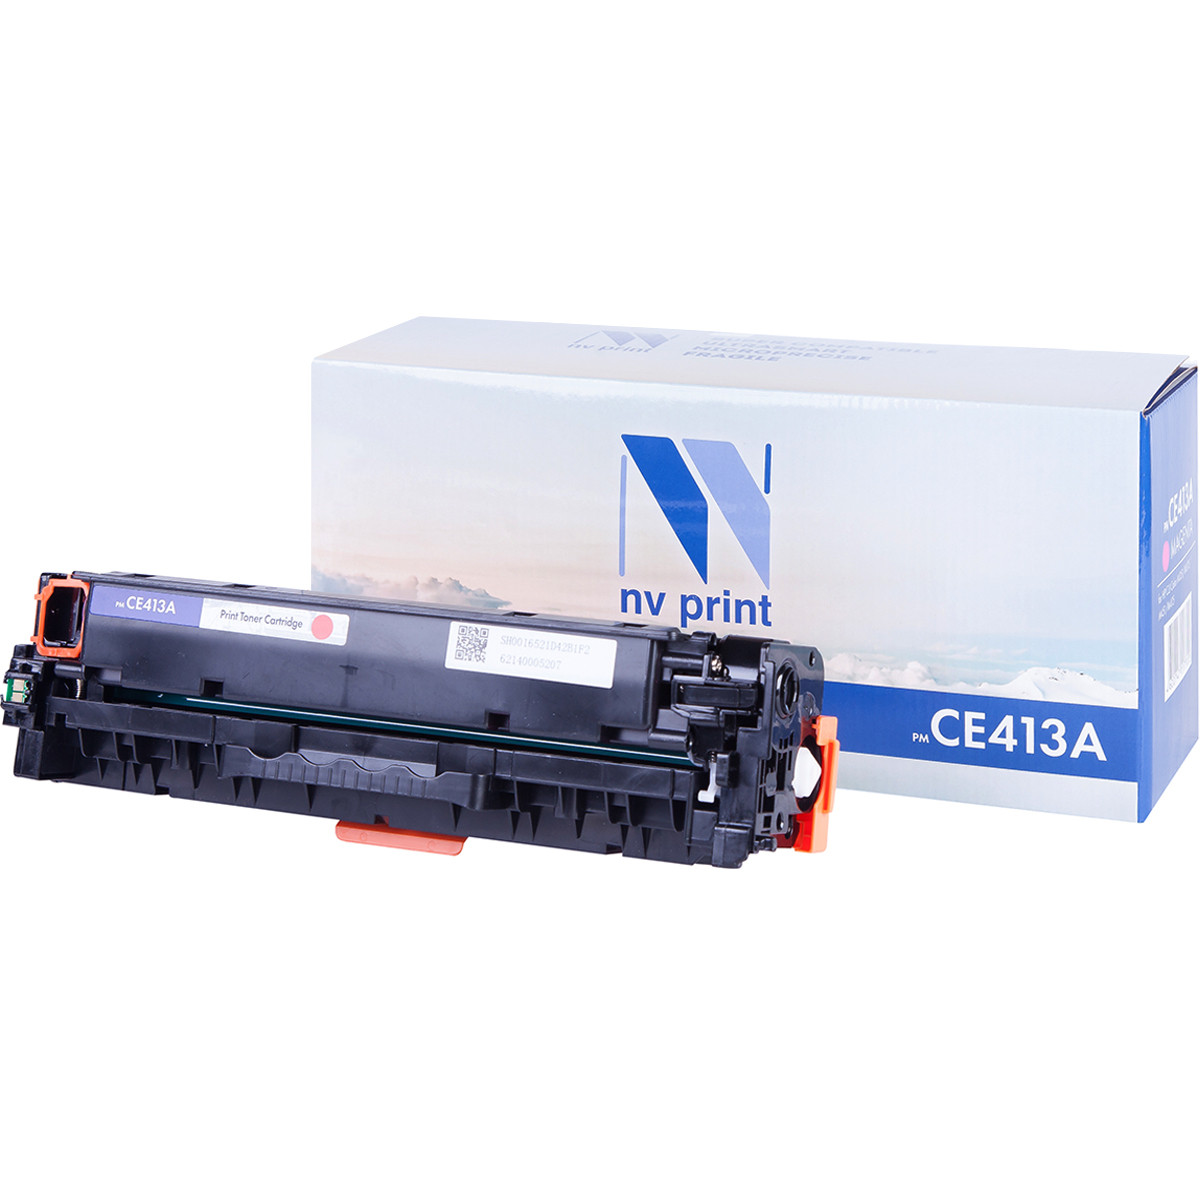 Картридж NVP совместимый HP CE413A Magenta для LaserJet Color M351a/M375nw/M451dn/M451dw/M451nw/M475